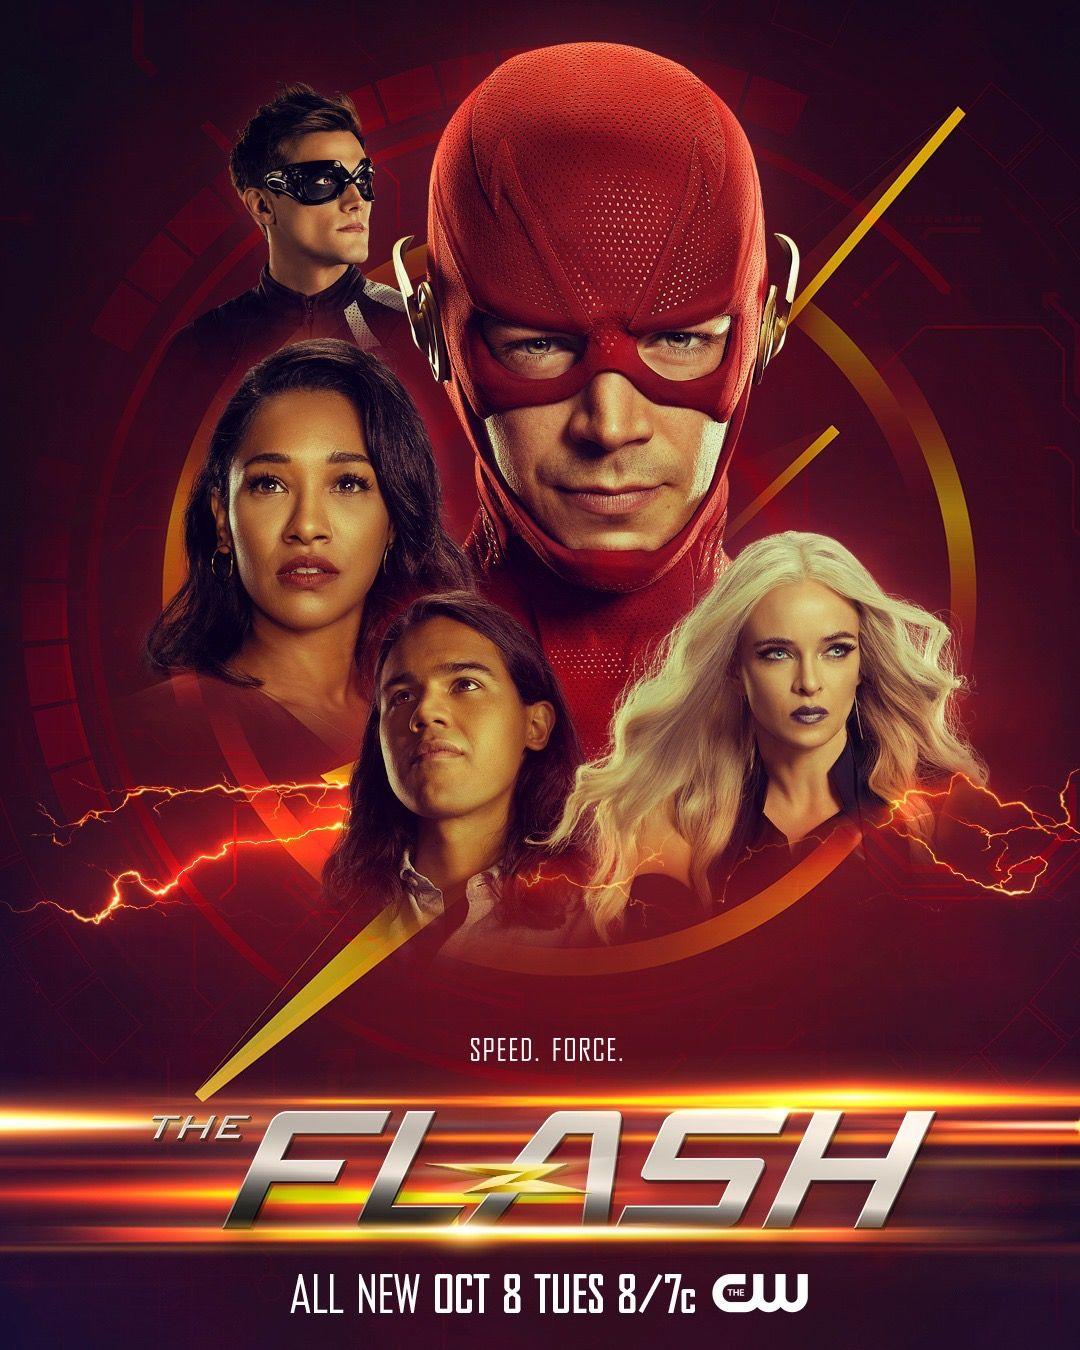 The Flash TV Series Superhero Art Silk Poster 12x18 24x36